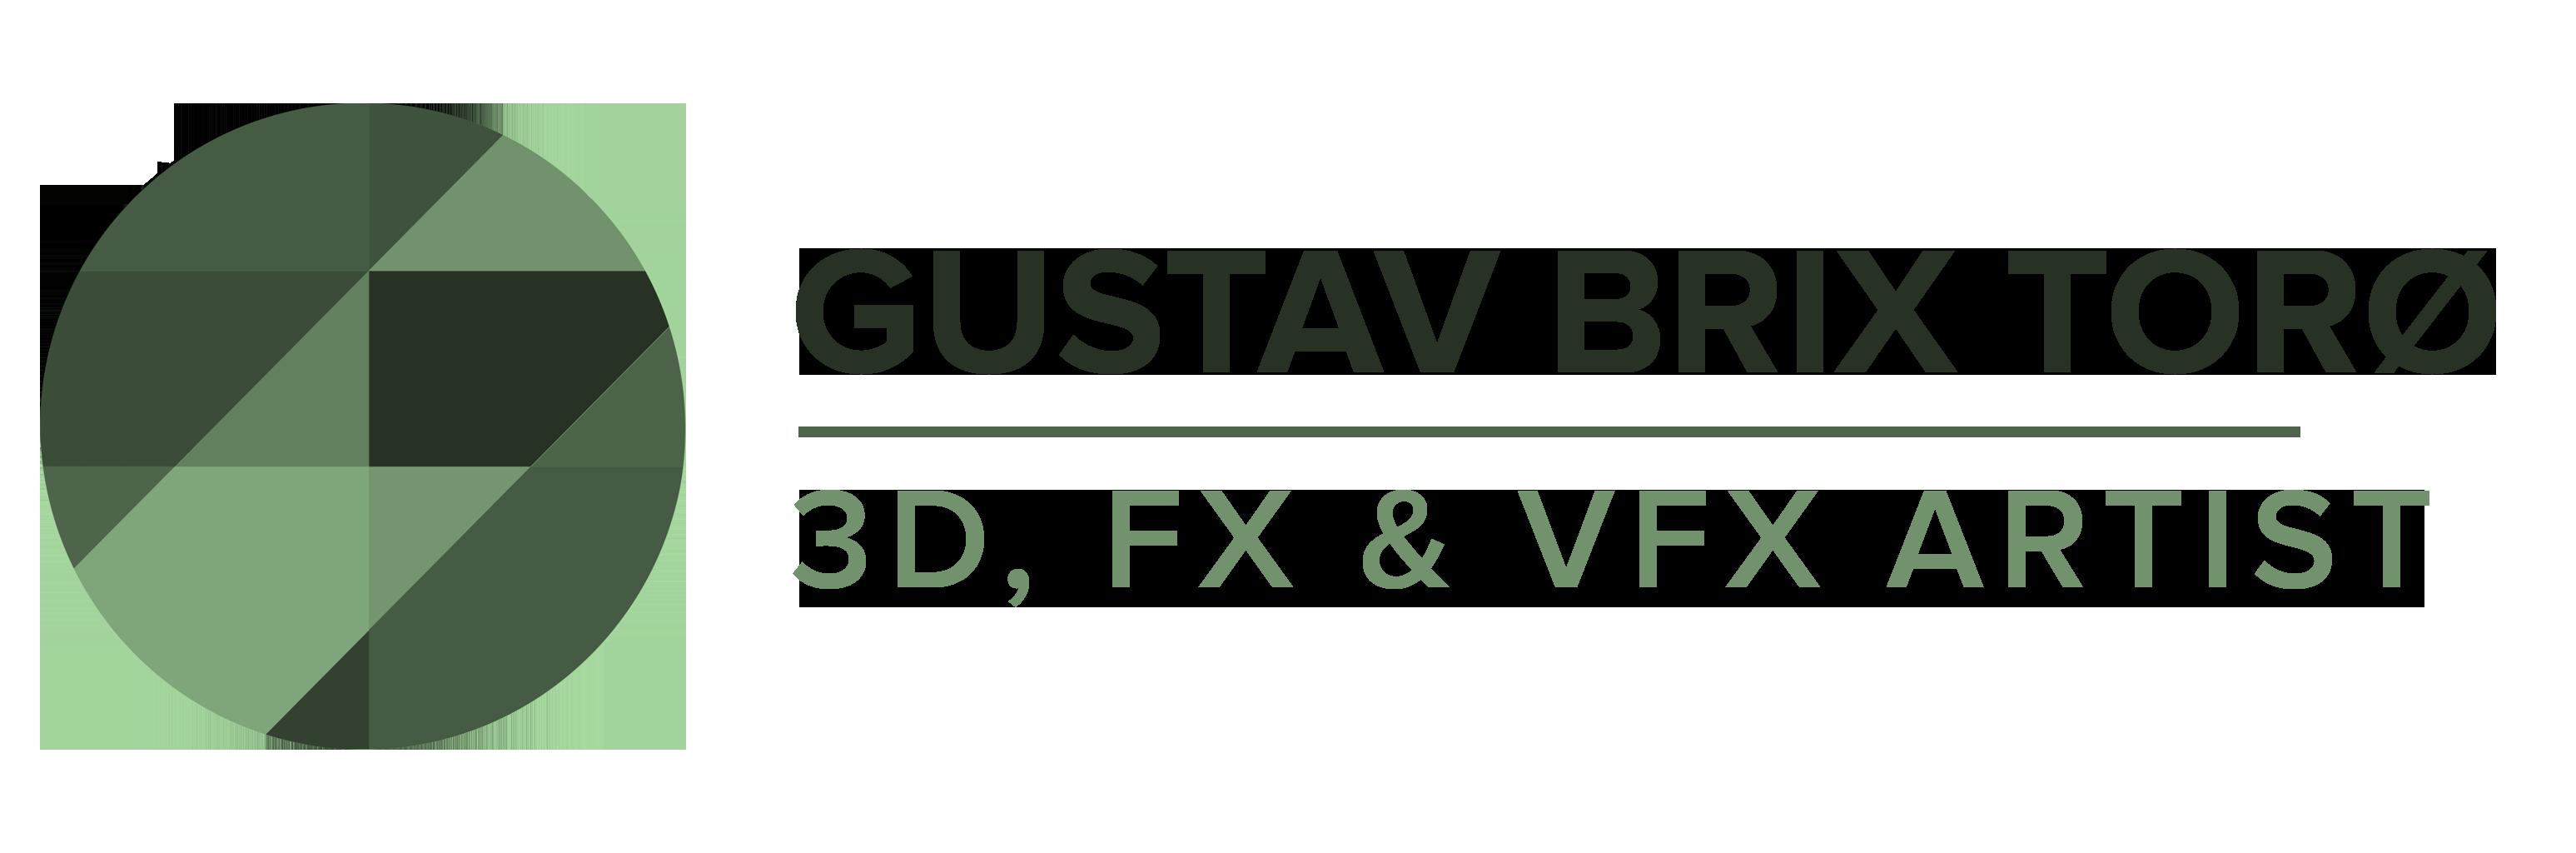 Gustav Brix